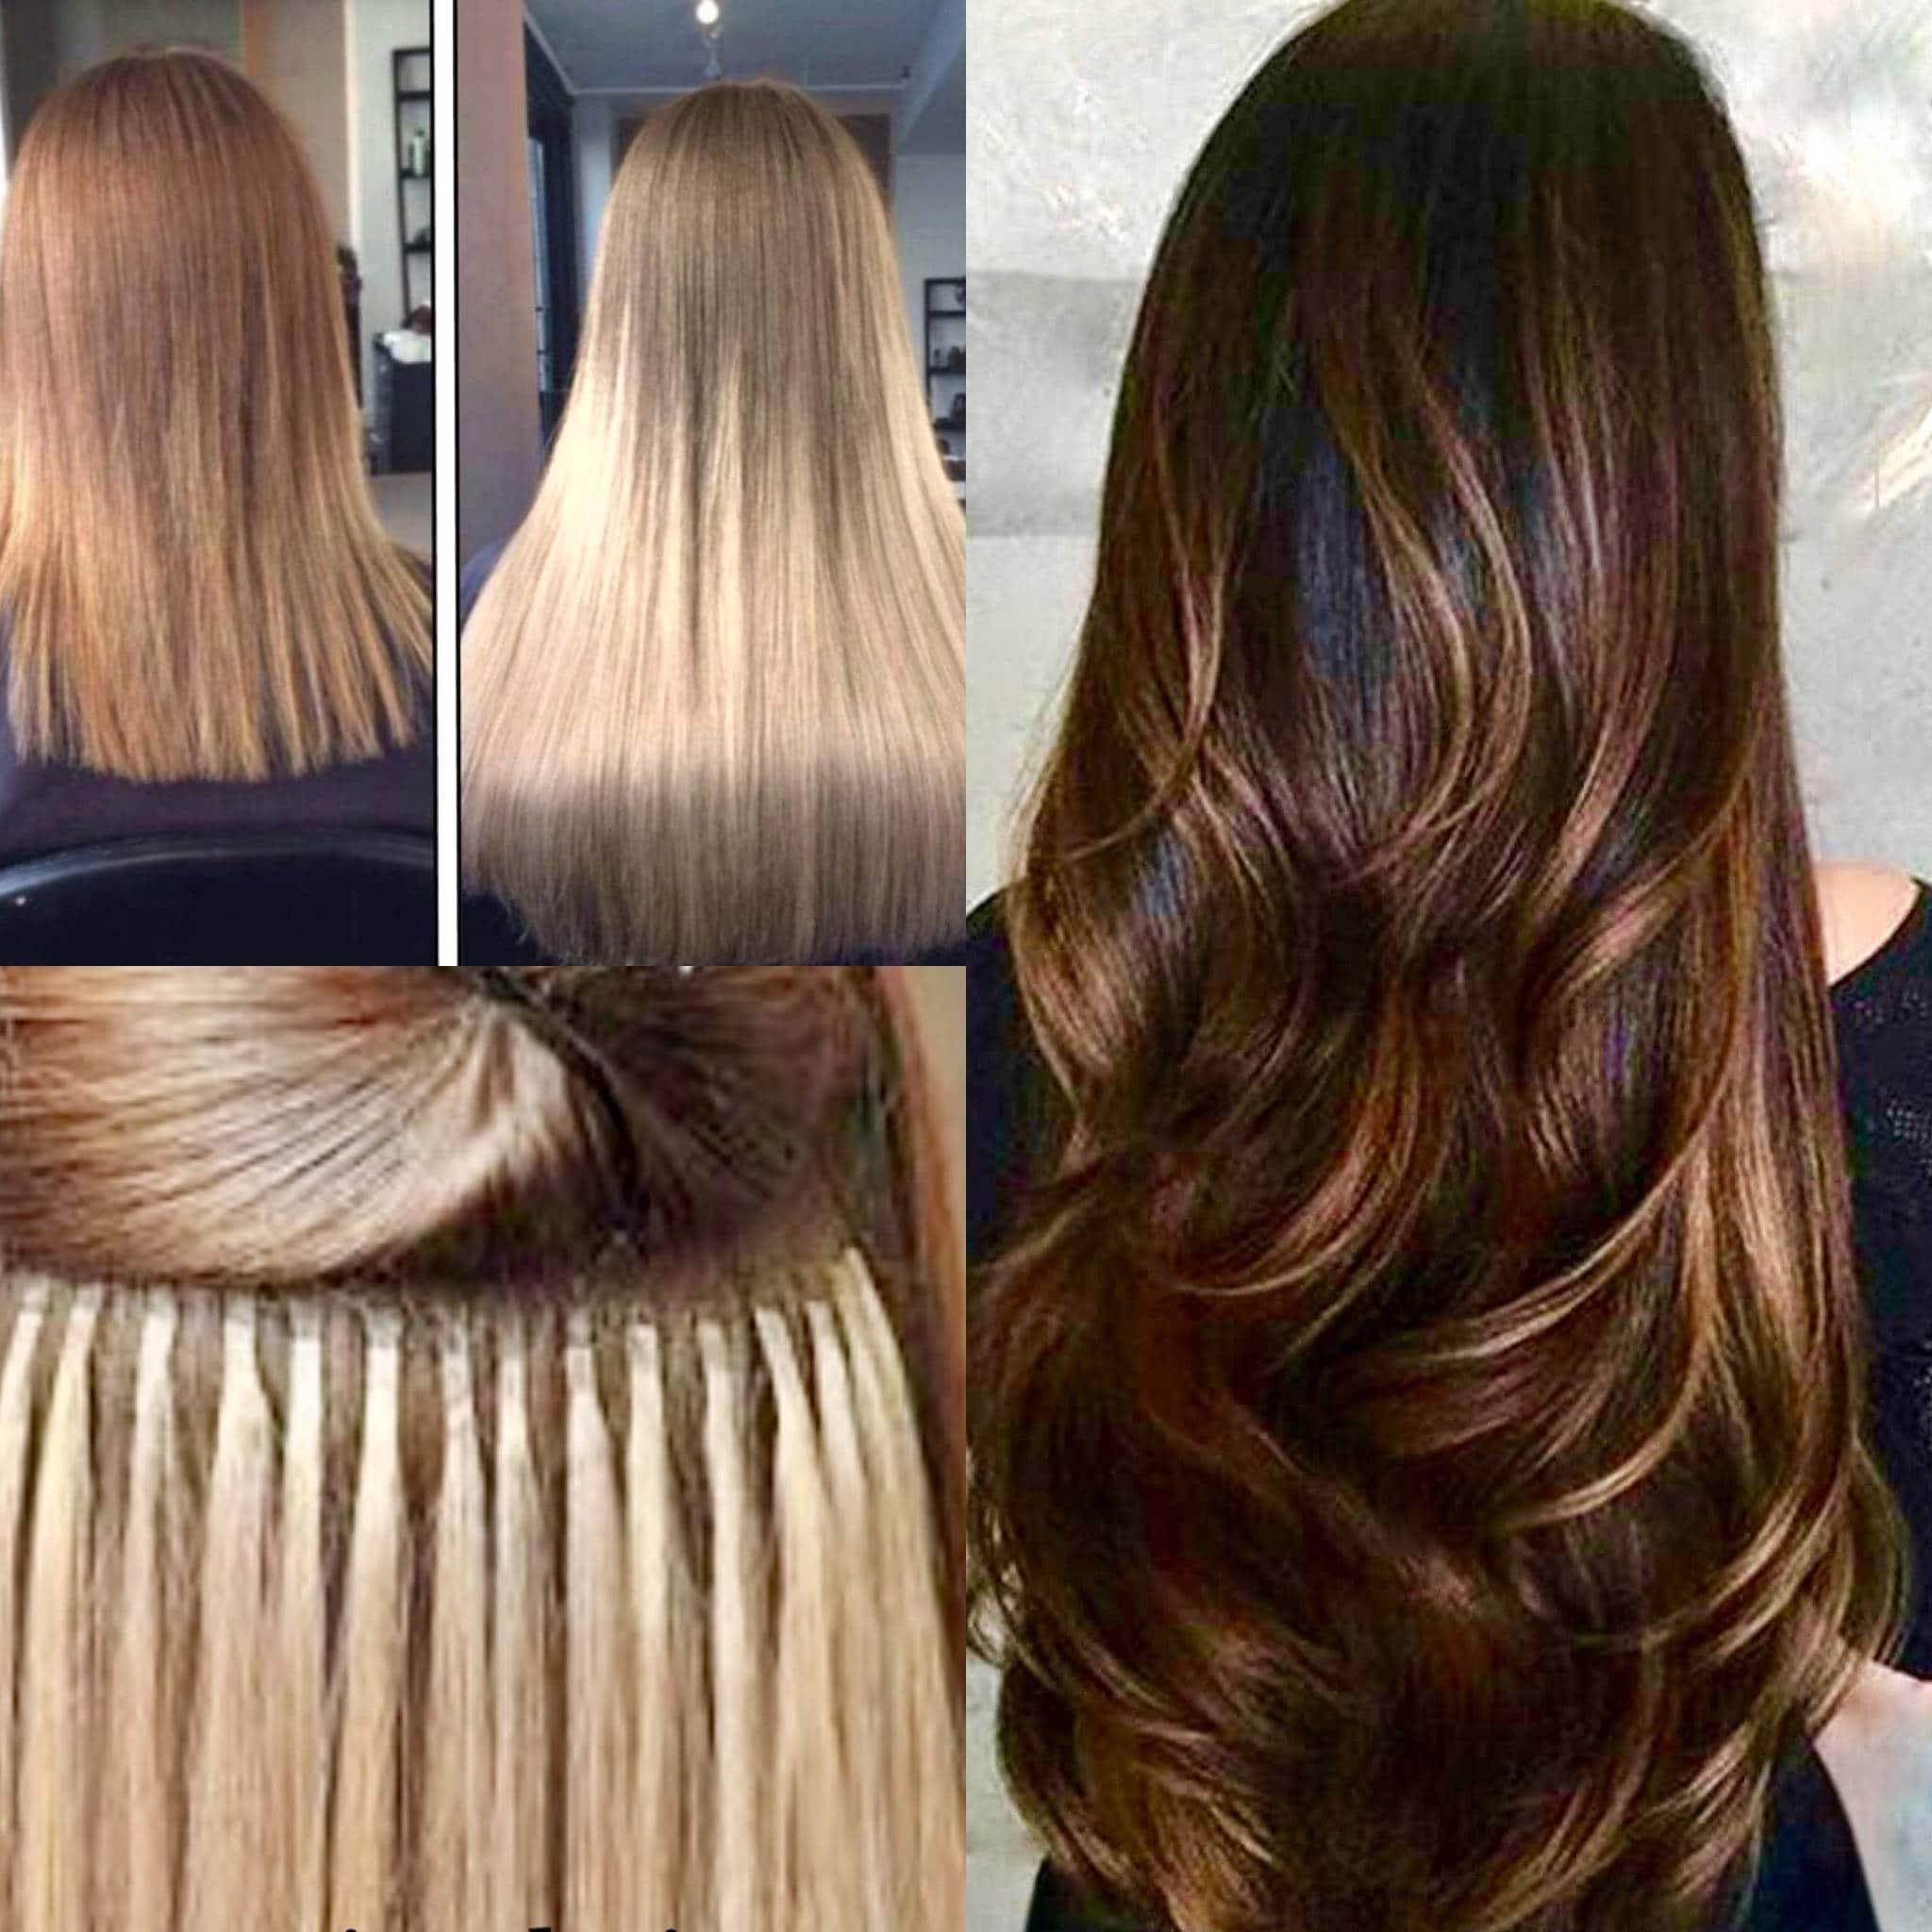 Lexi Locks Ombre 22 Inch Fusion Locks Hair Extensions 100 Human